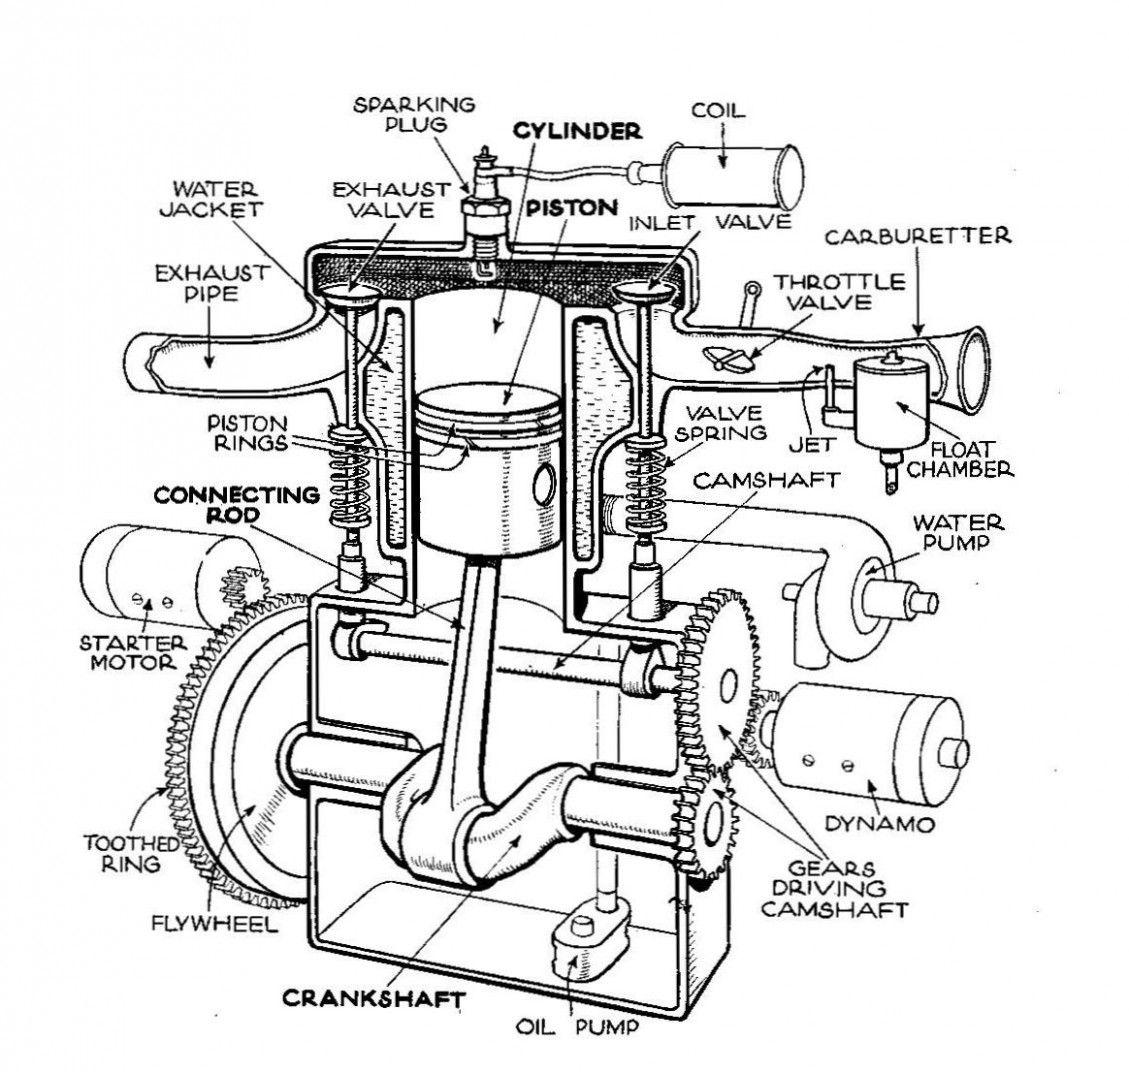 Engine Diagram Labeled Engine Diagram Labeled